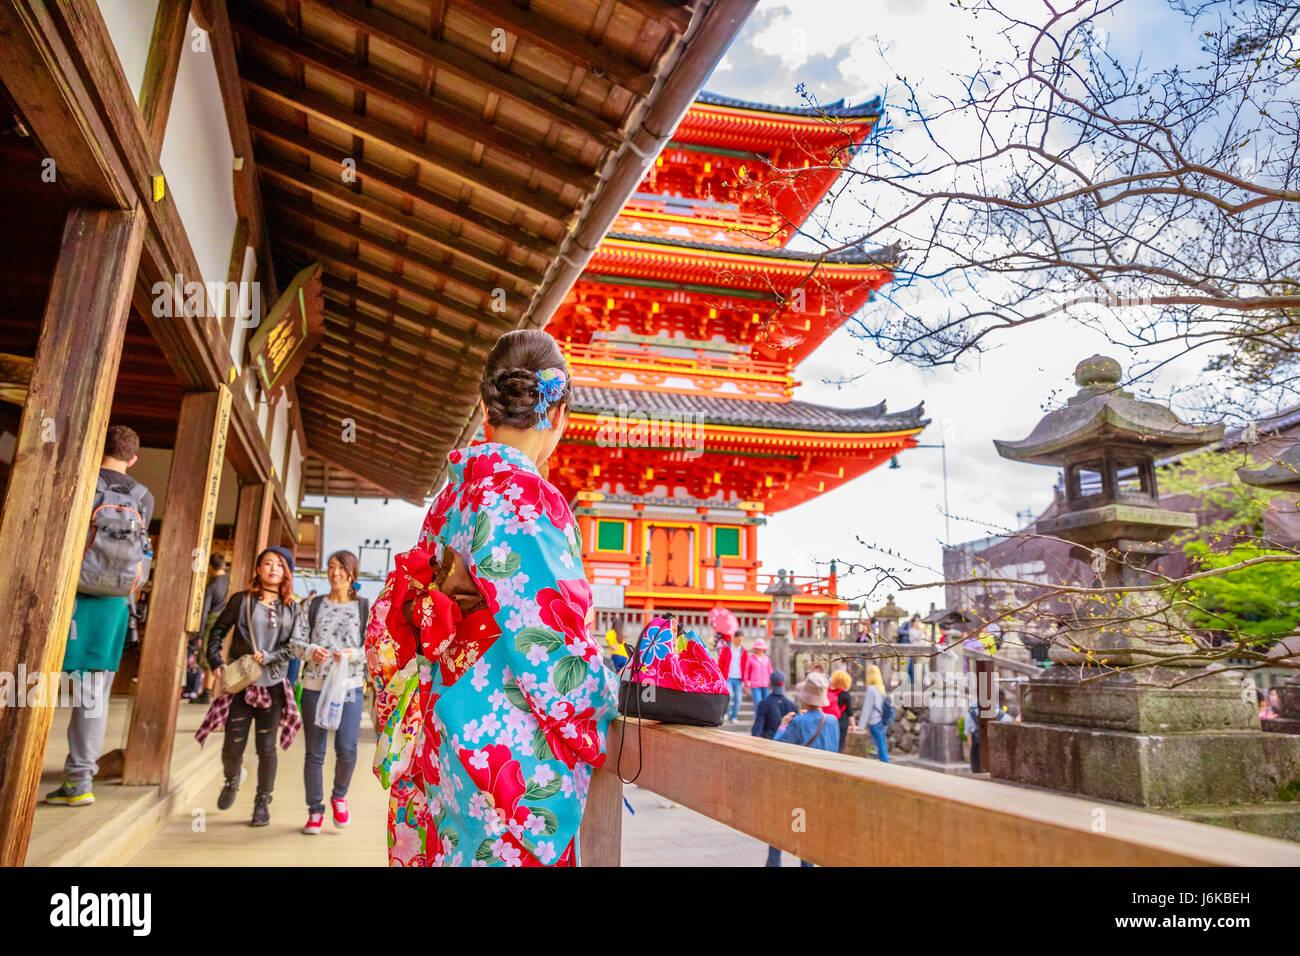 Japon Kyoto Kiyomizudera Photo Stock